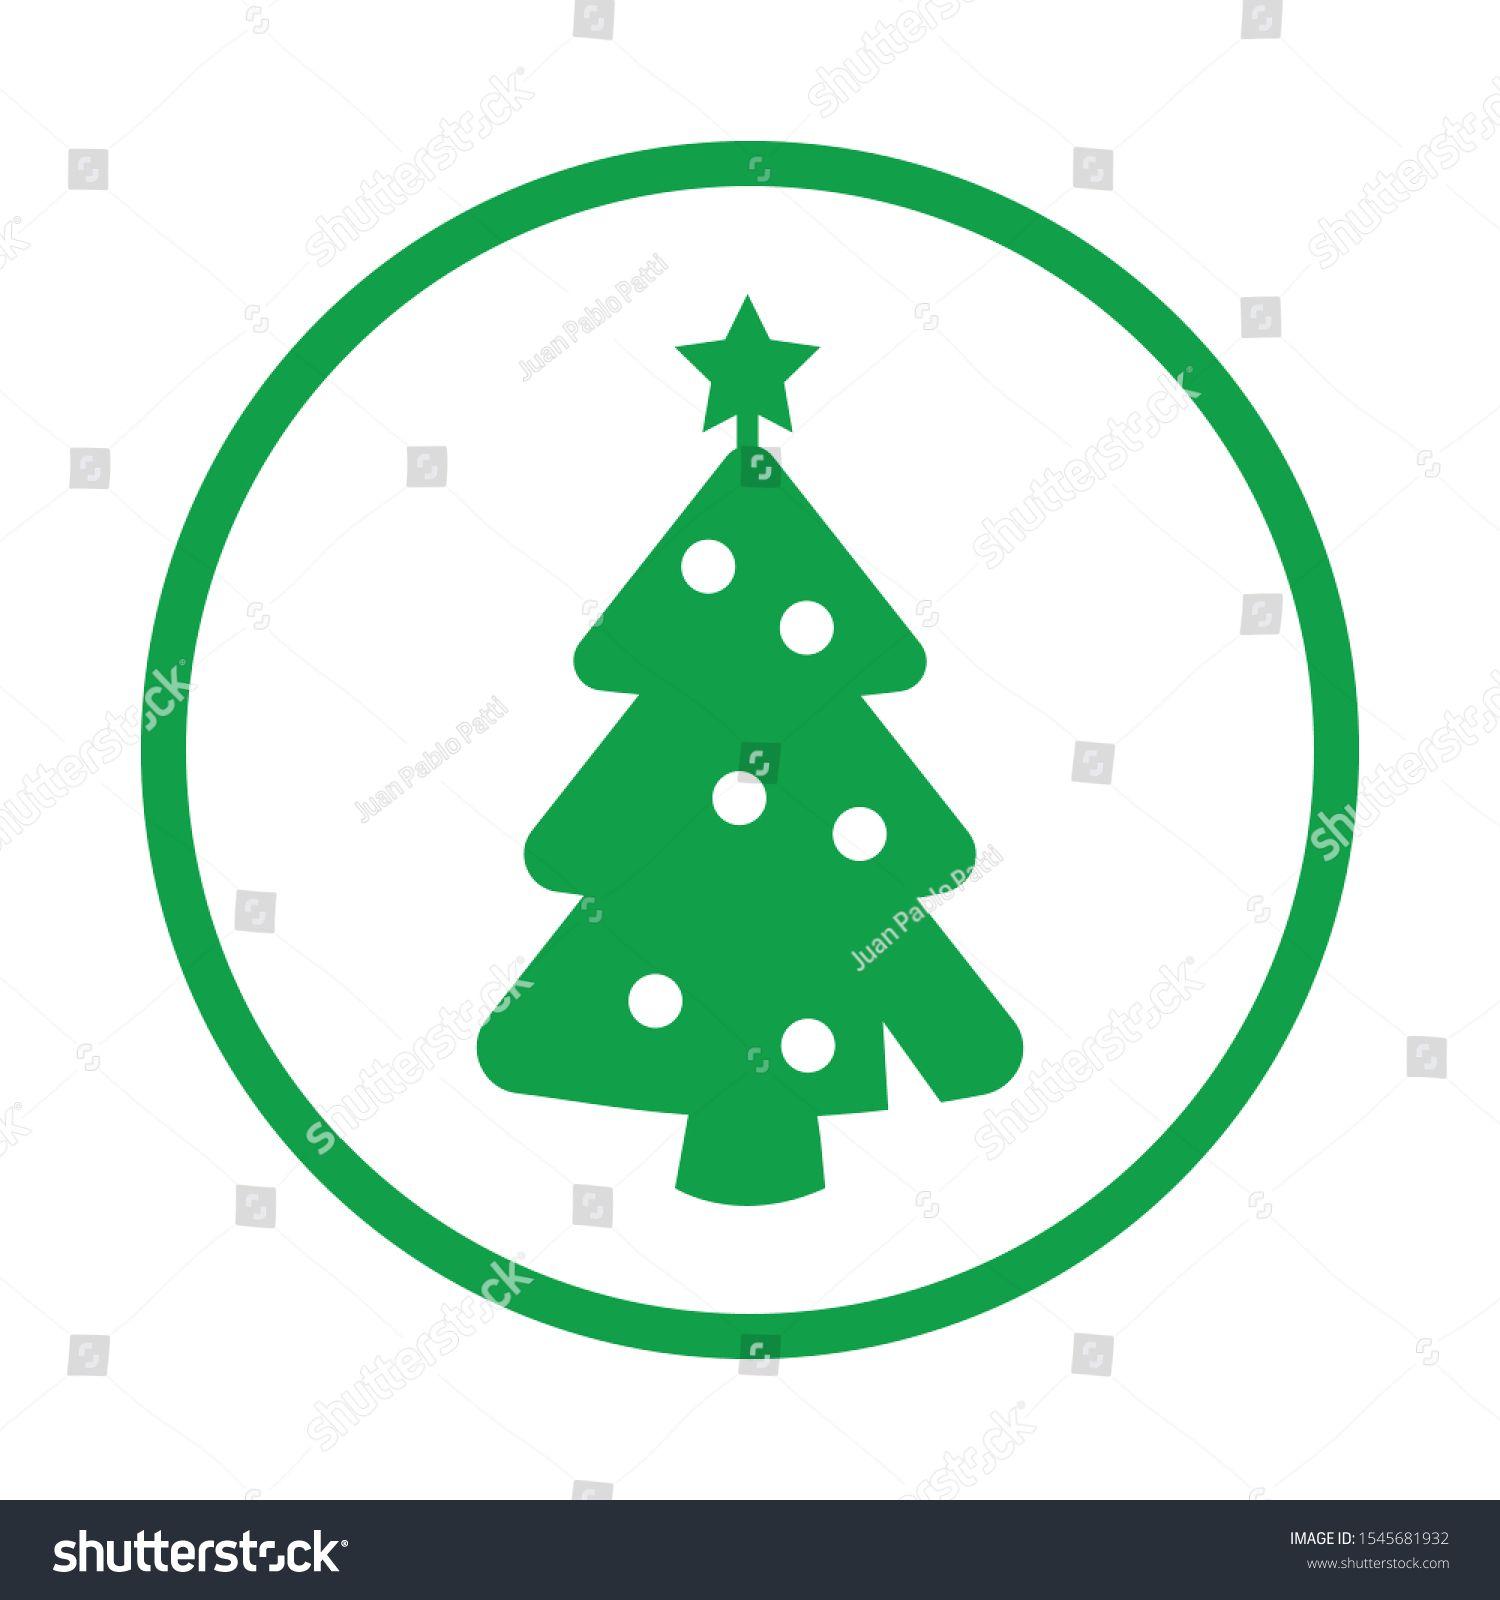 Christmas Tree Icon Holidays Vector Illustration Ad Ad Icon Tree Christmas Illustration Christmas Illustration Tree Icon Holiday Vectors